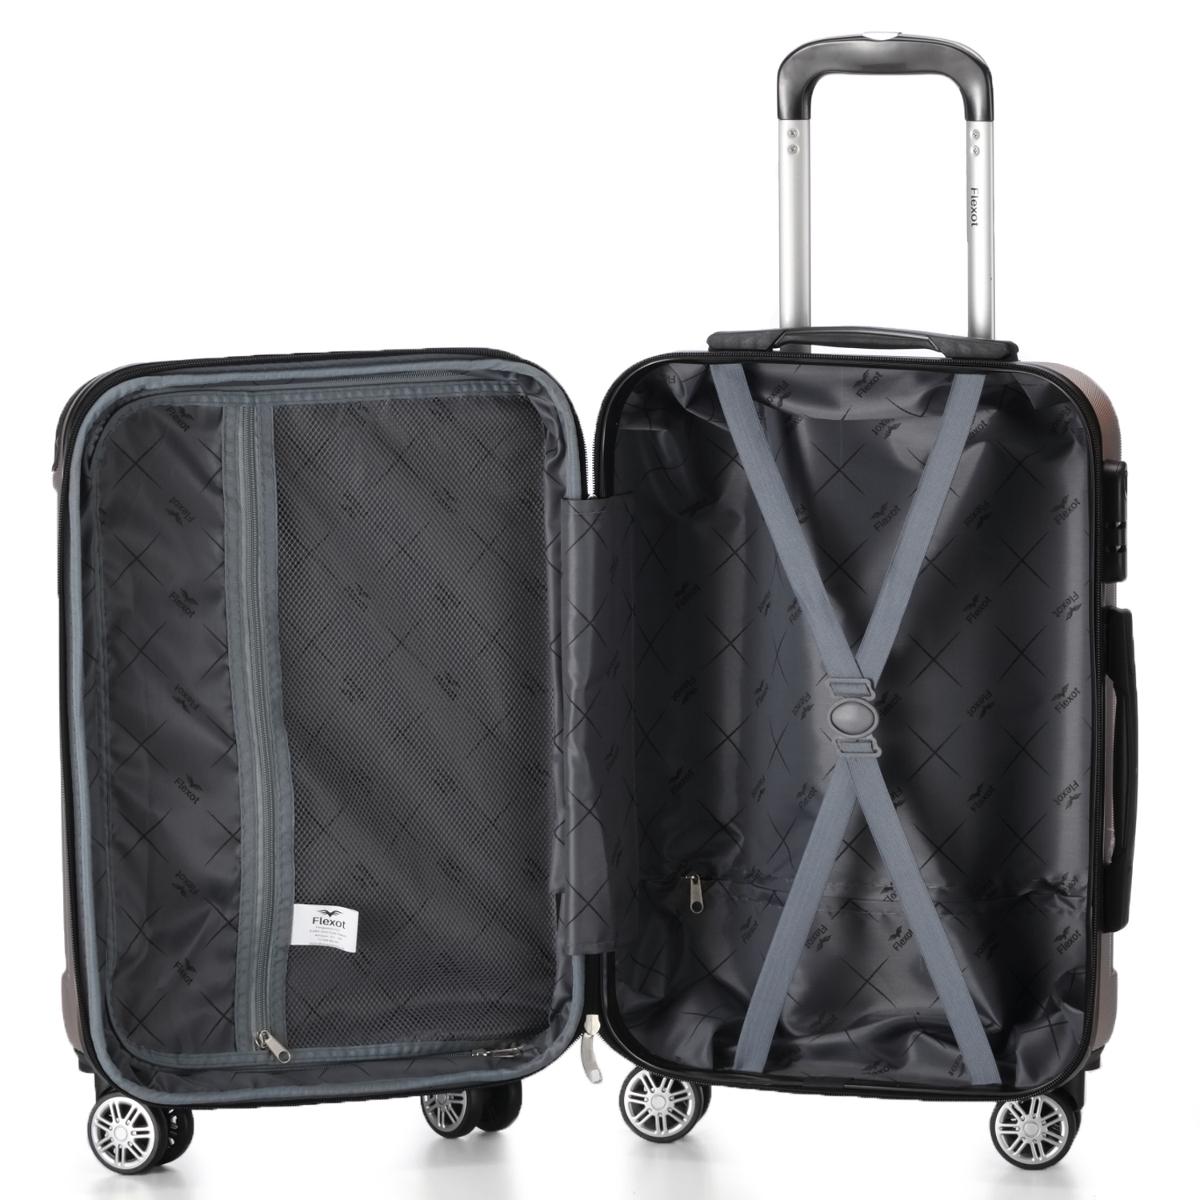 Koffer-Flexot-2045-Hartschalenkoffer-Trolley-Kofferset-Reisekoffer-M-L-XL-Set Indexbild 100